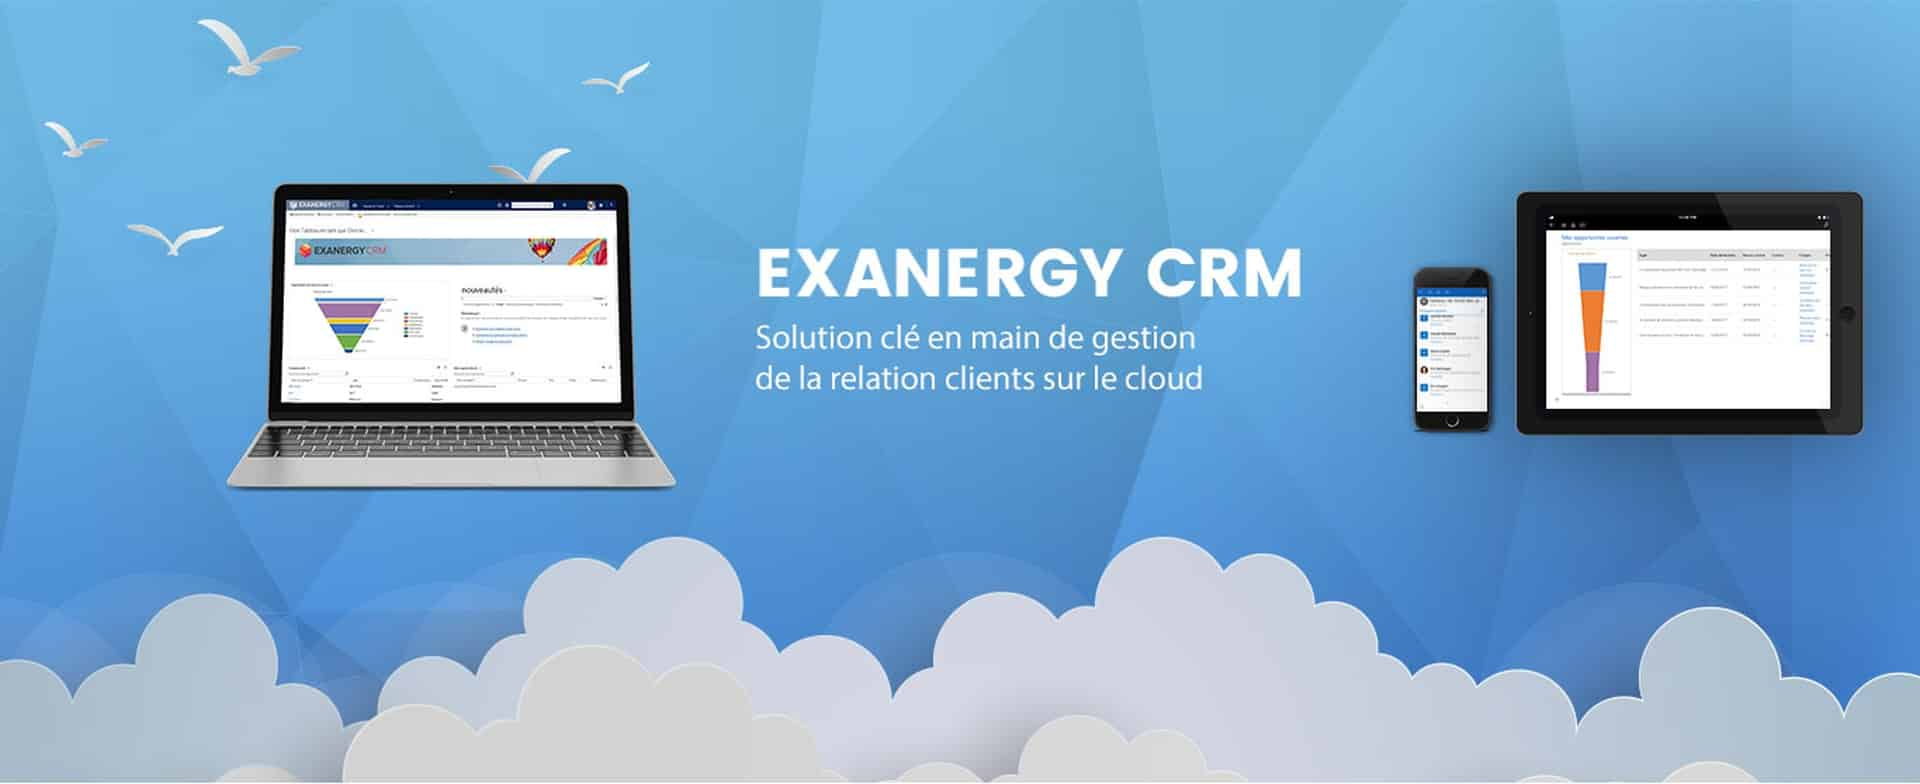 bannière Exanergy CRM